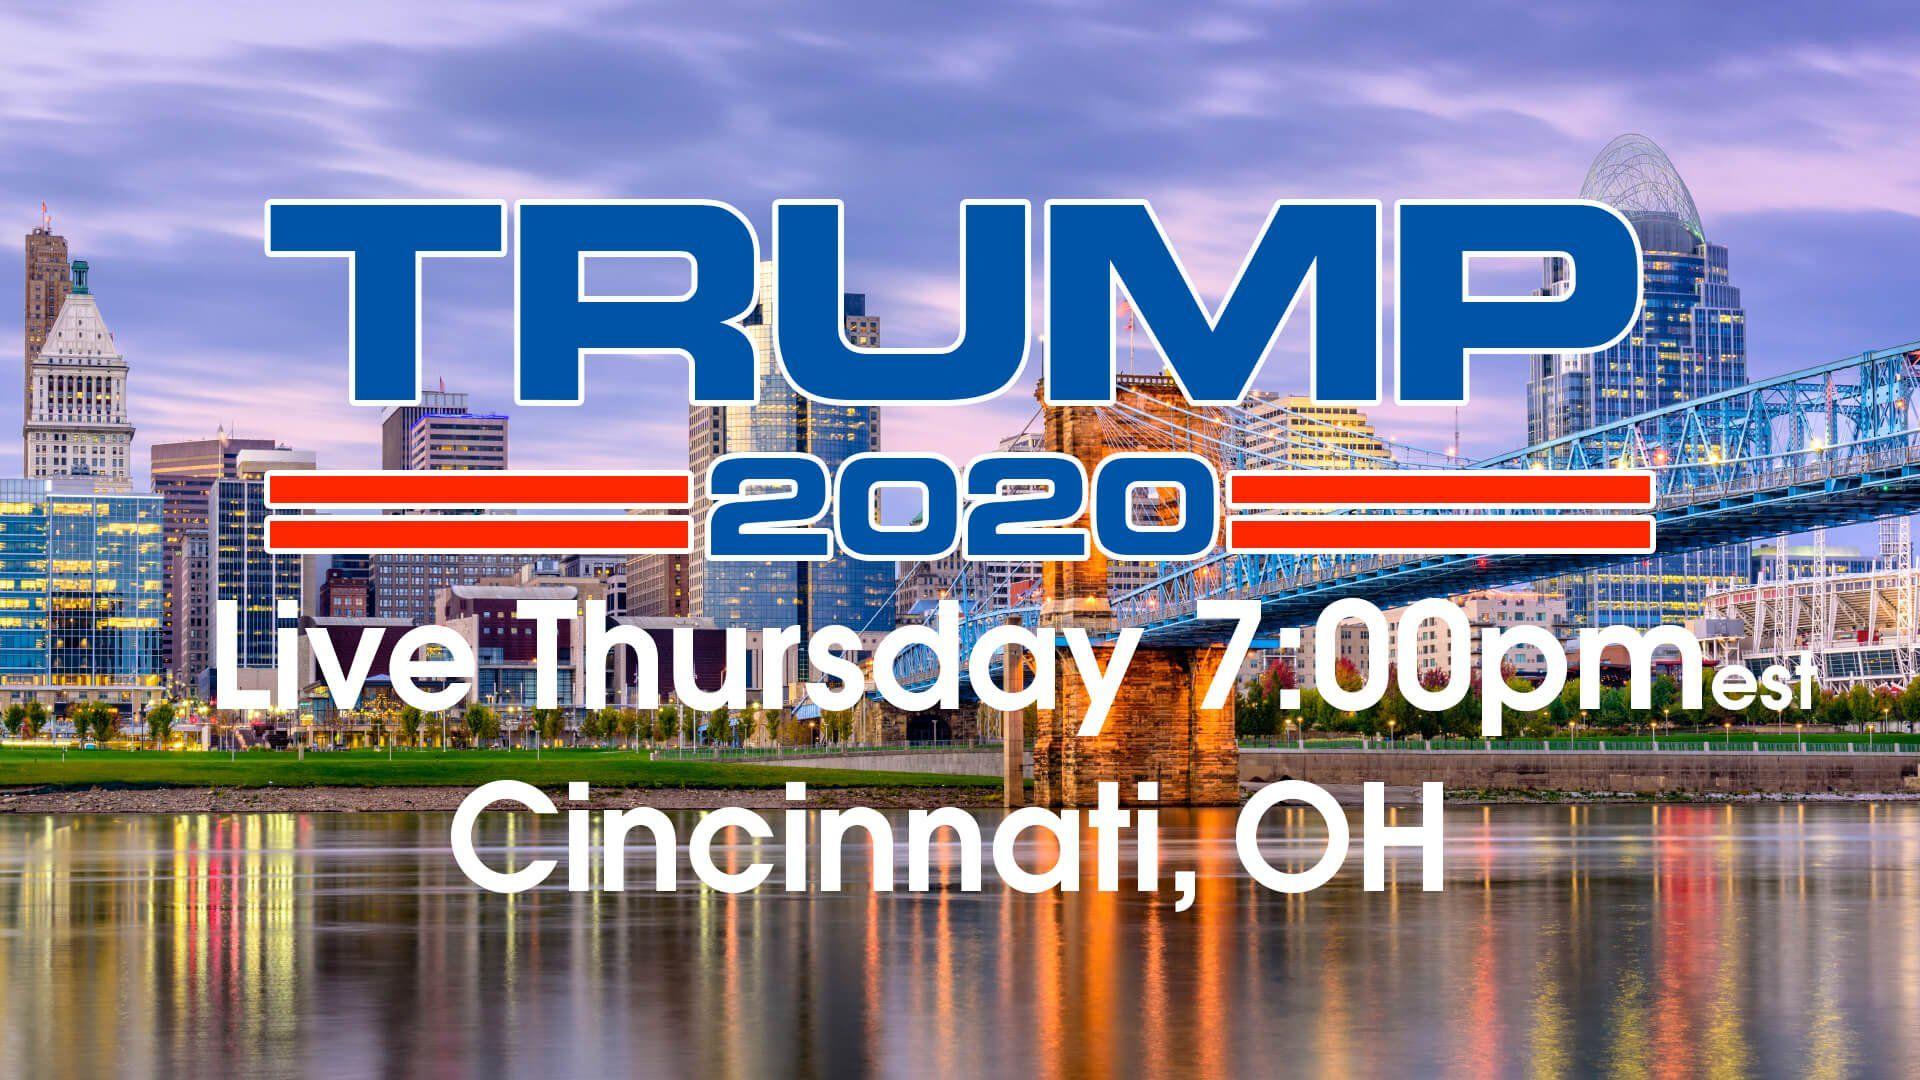 Trump Rally Live in Cincinnati Ohio